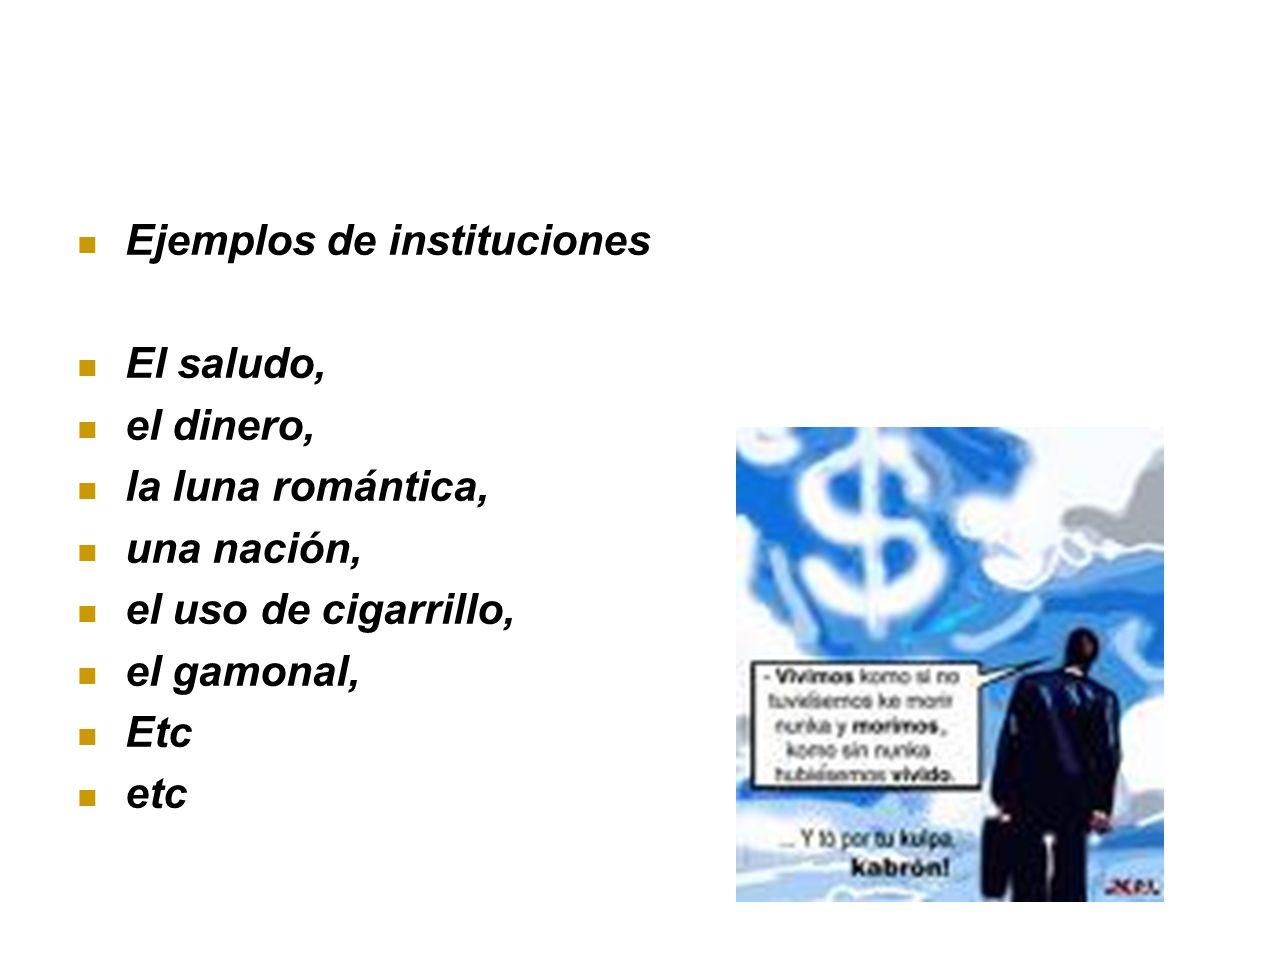 Ejemplos de instituciones